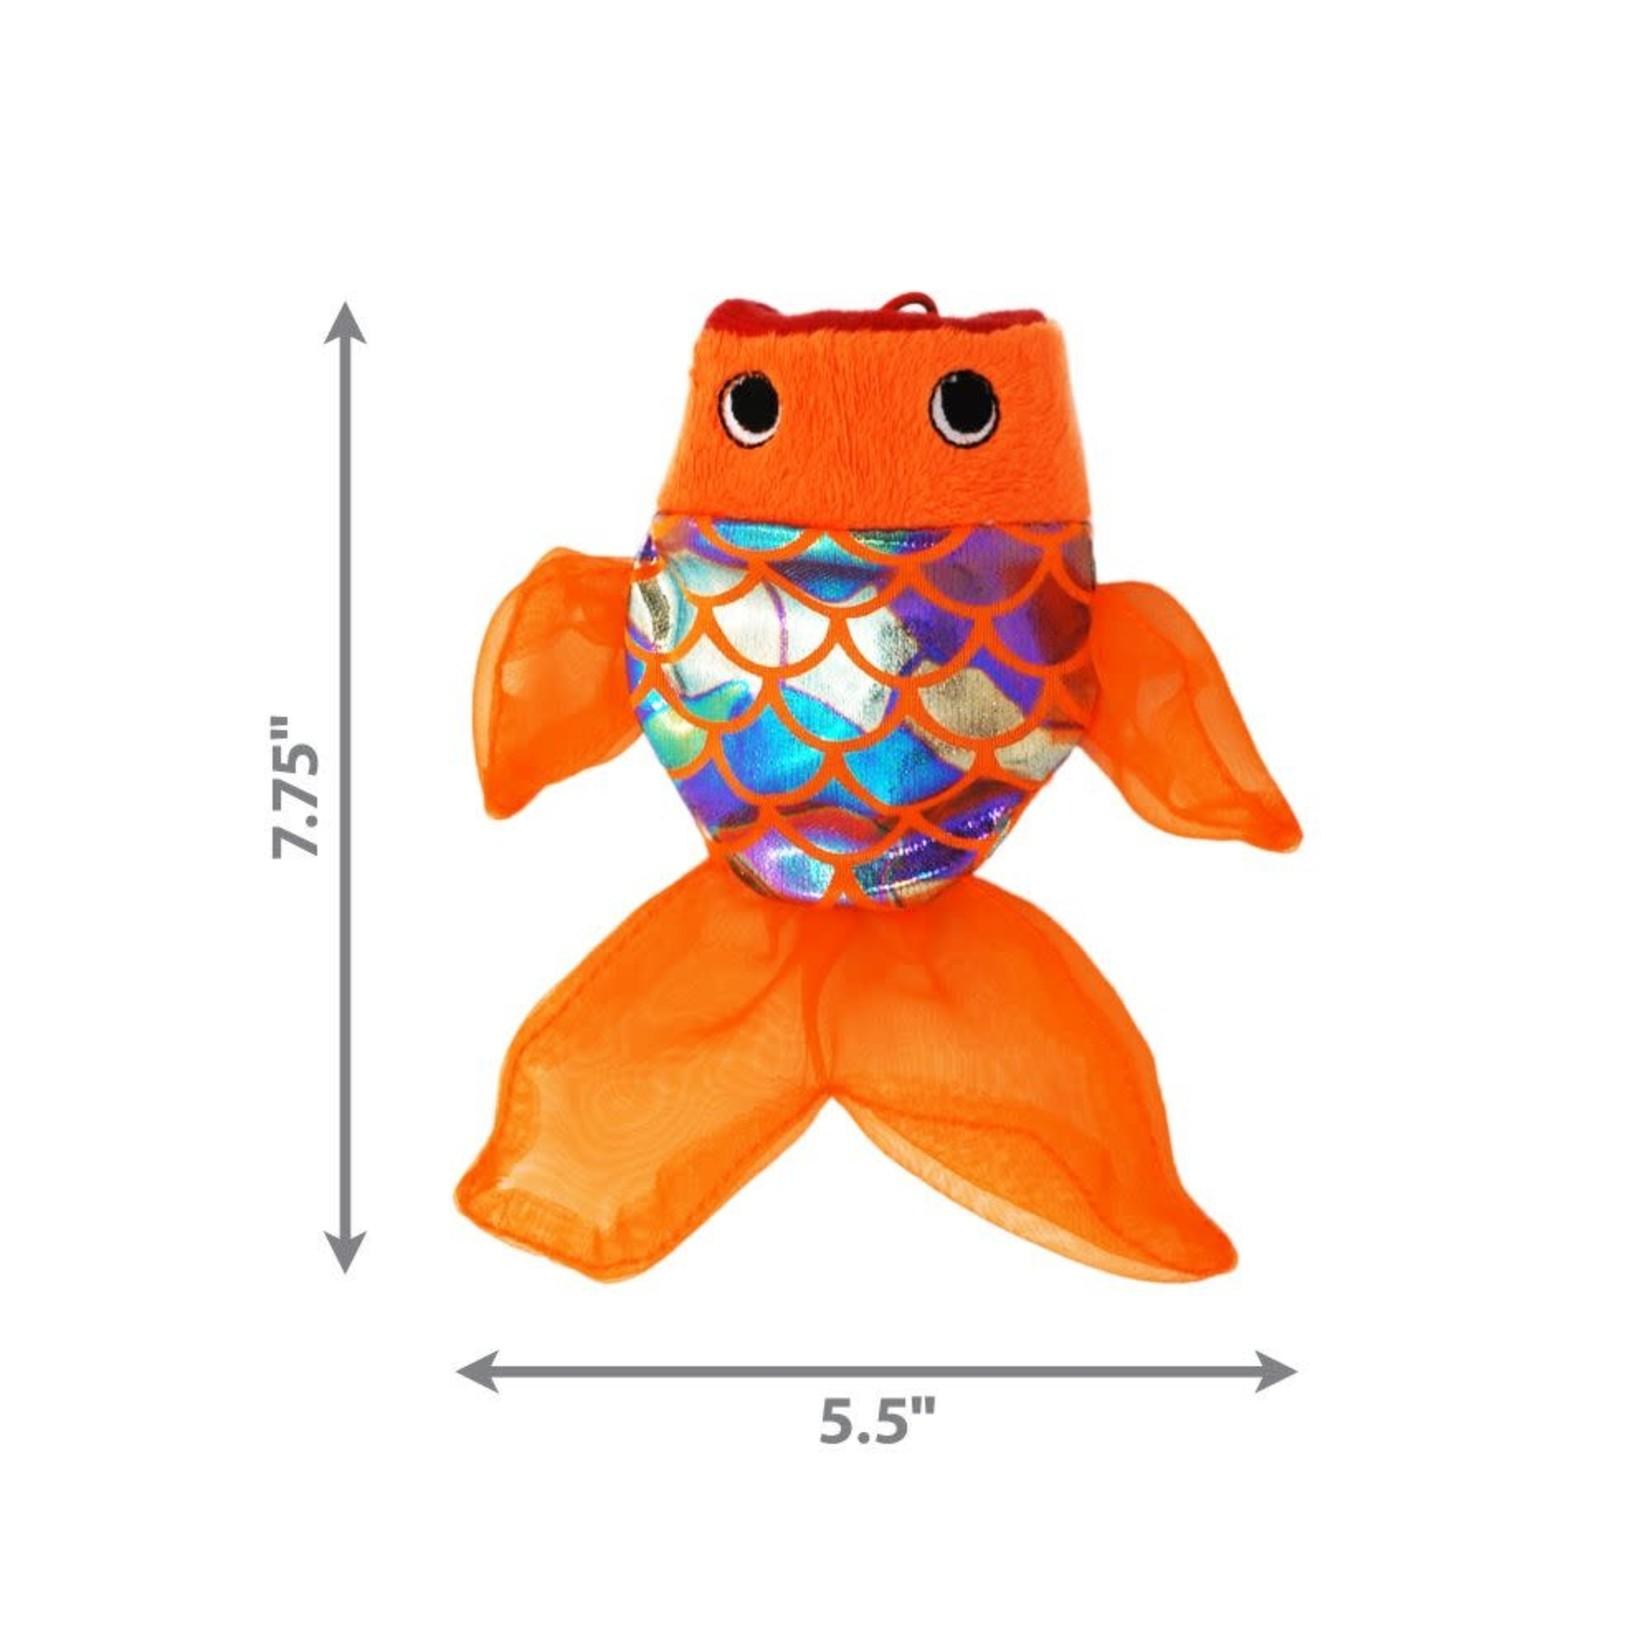 KONG Crackles 'Gulpz' Catnip Cat Toy